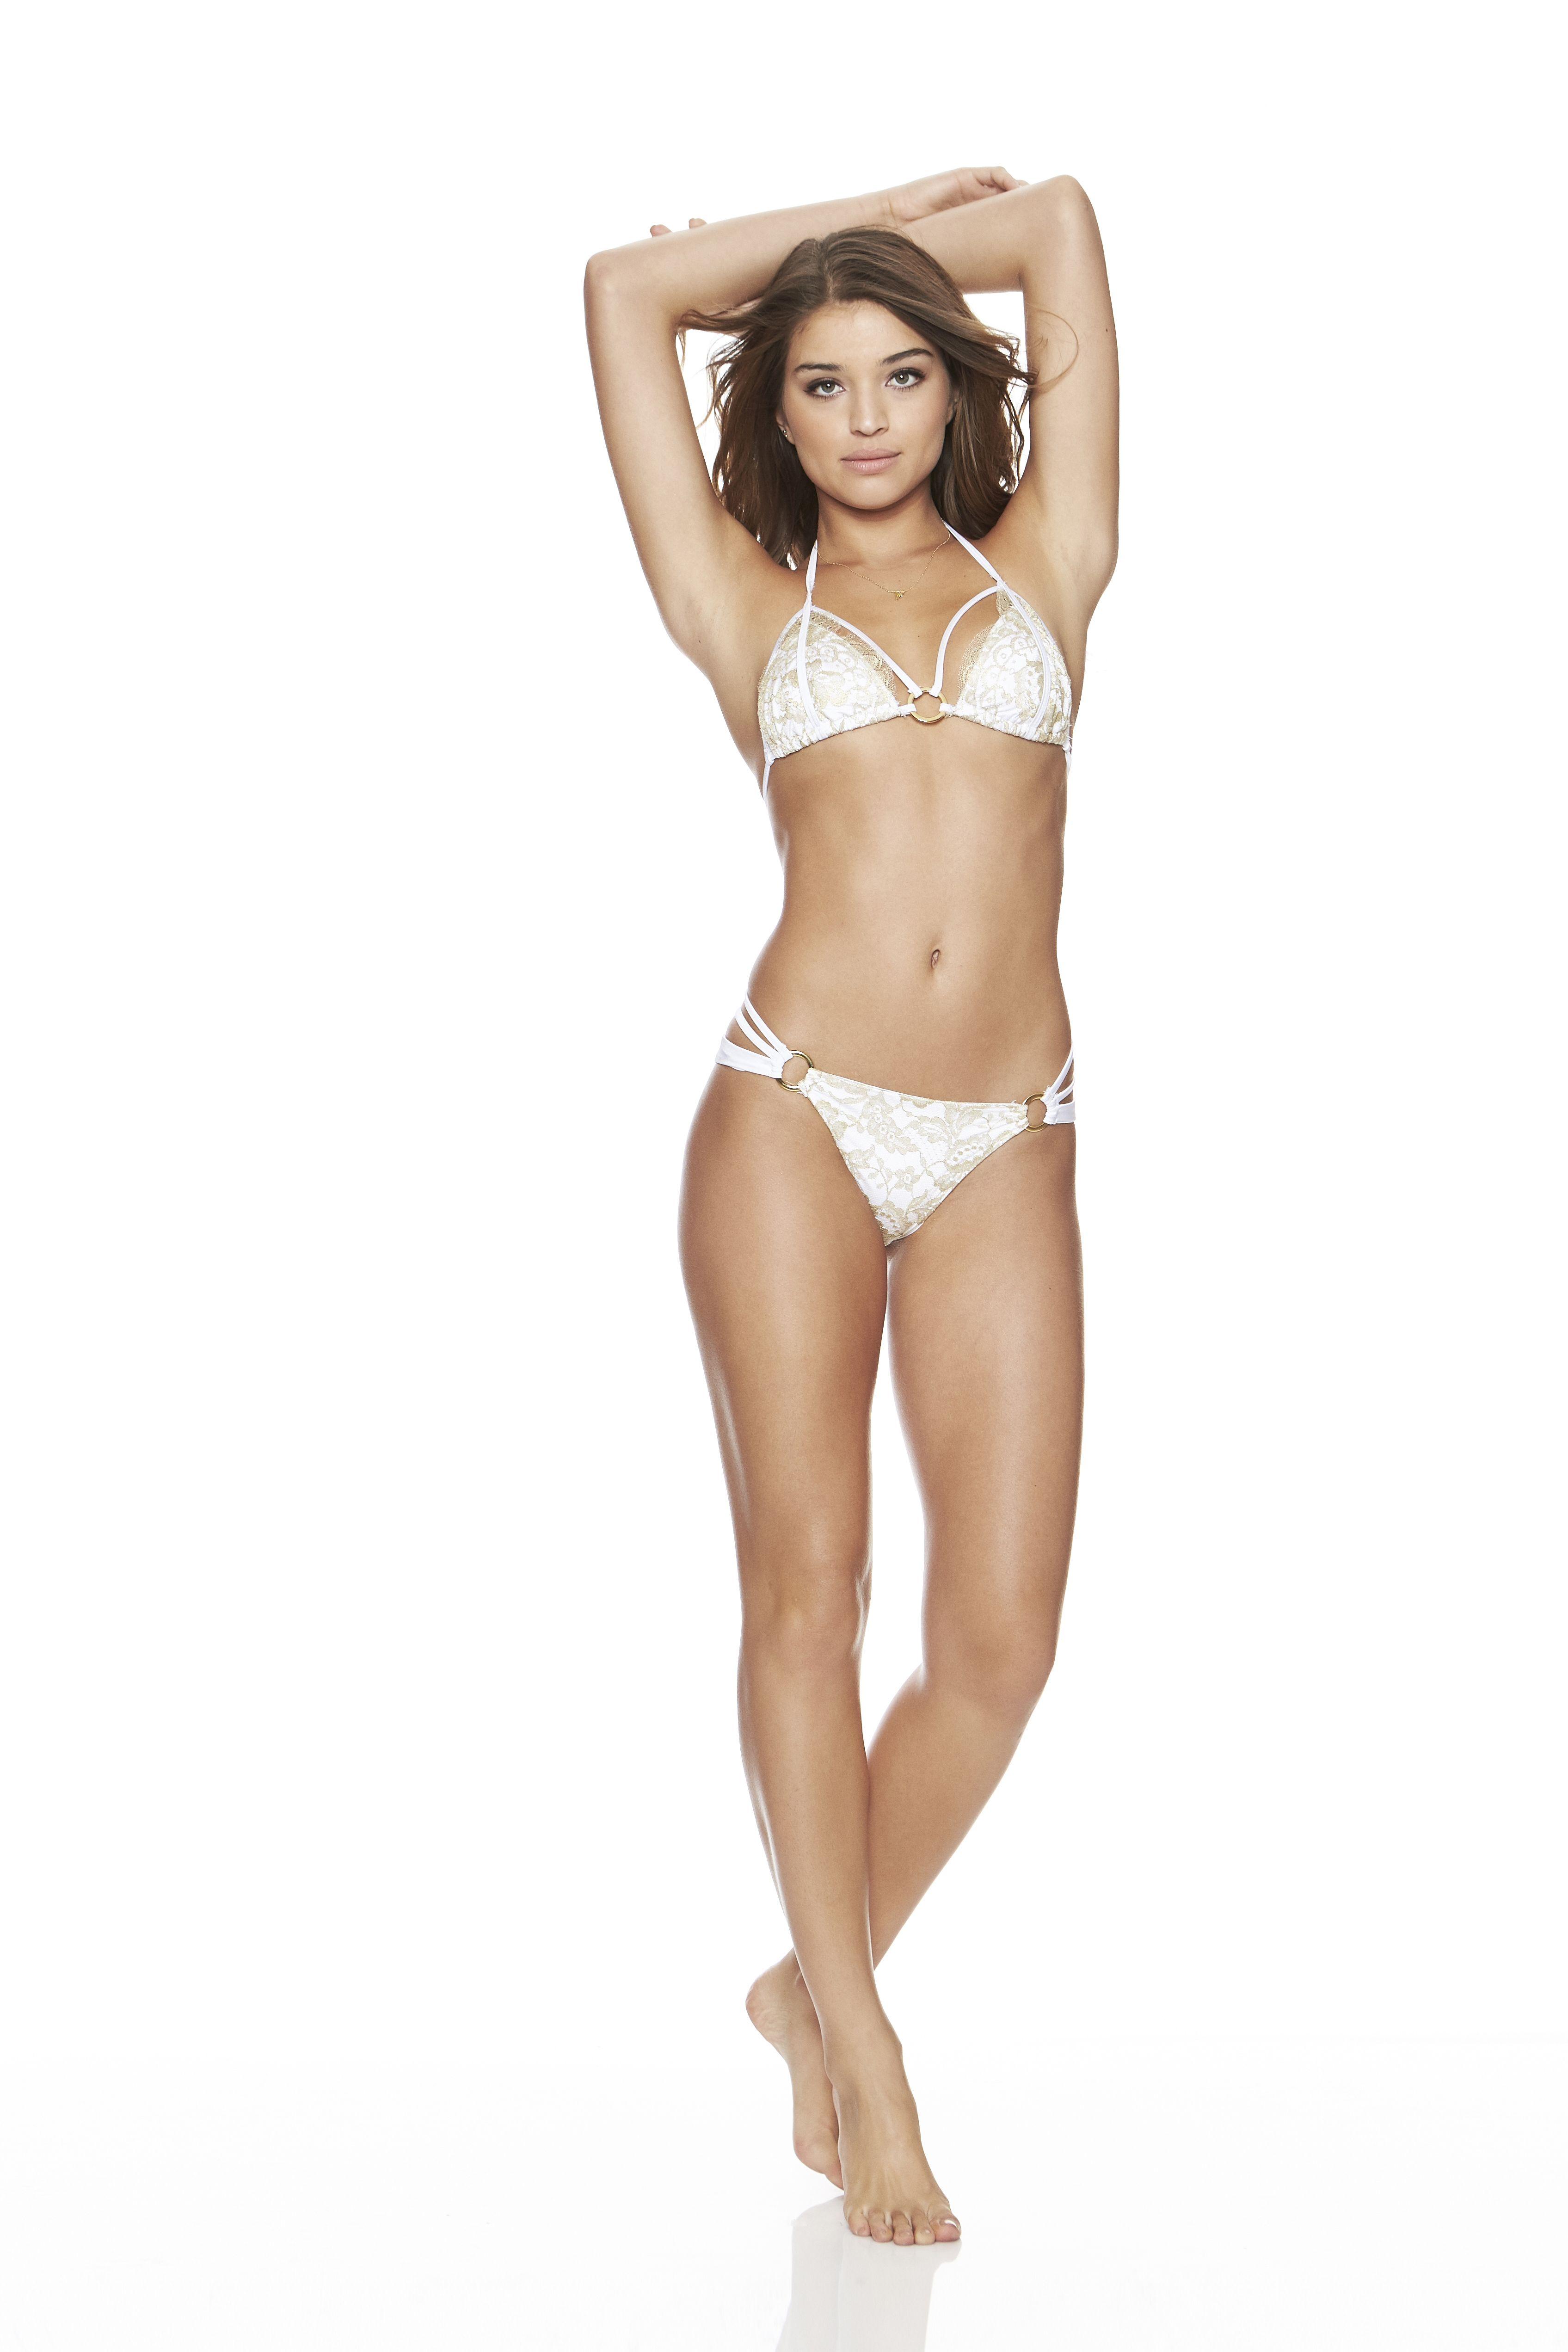 Sexy Pics Of Daniela Lope...